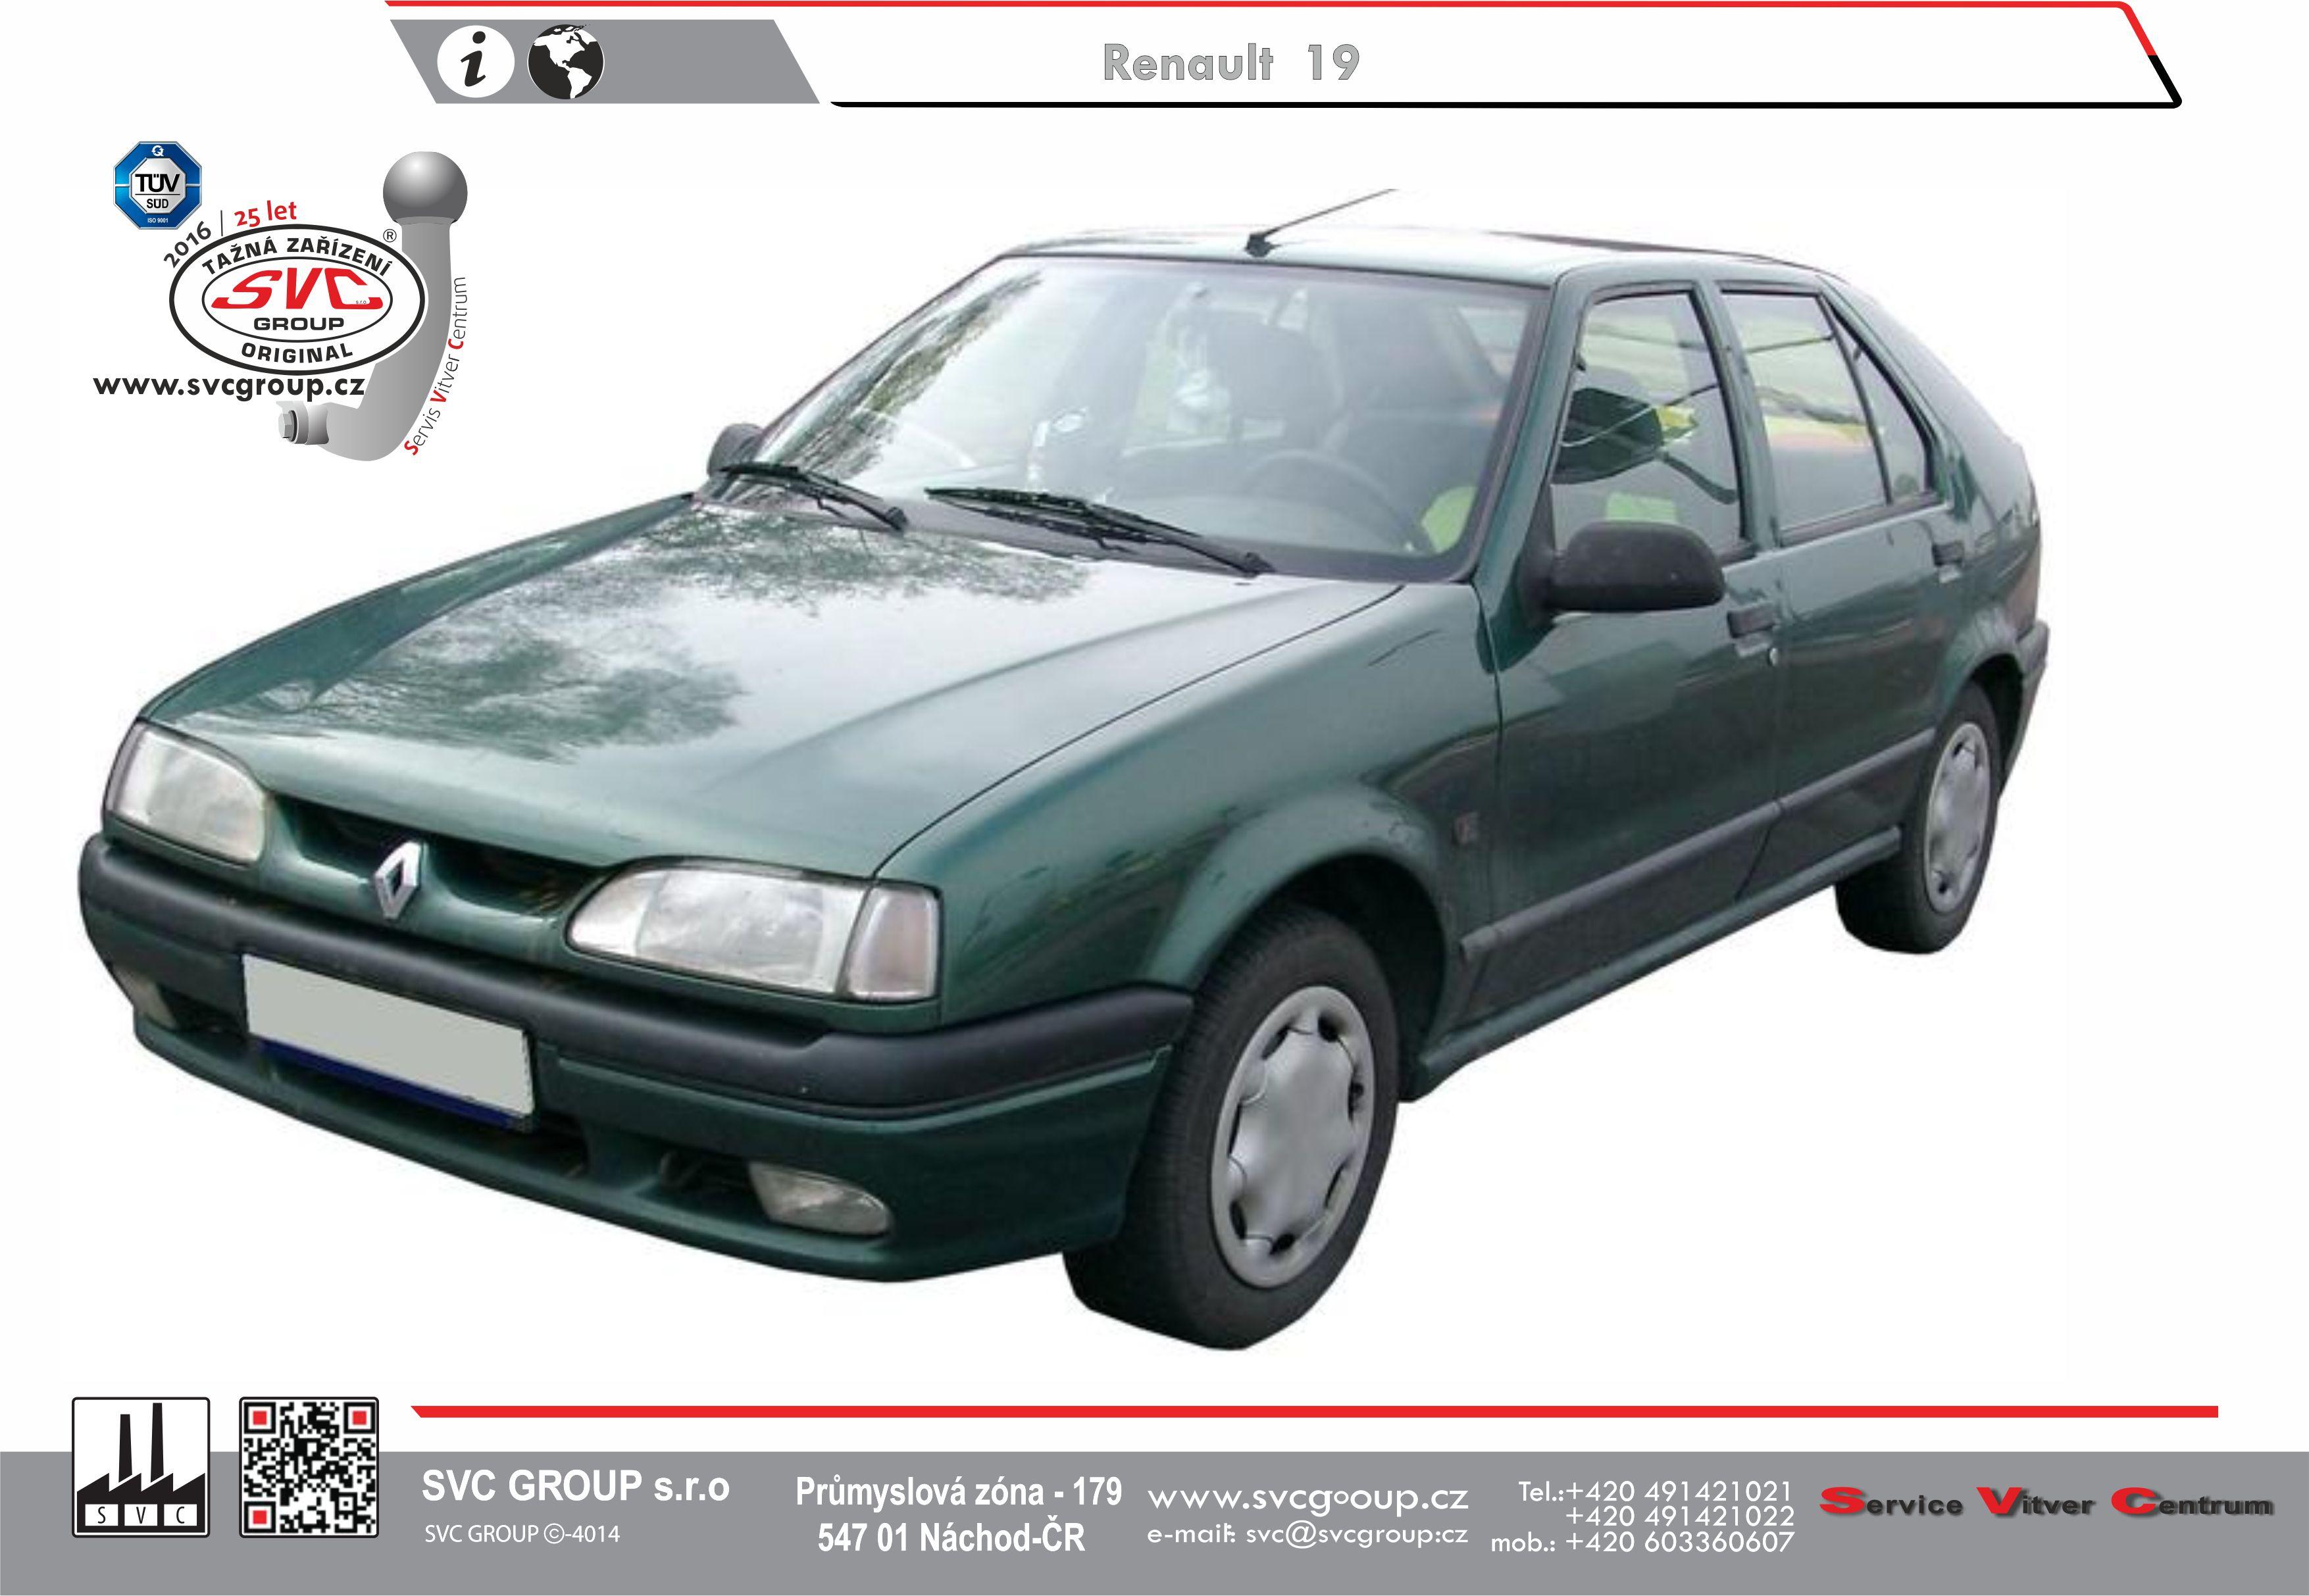 Renault 19 Hatchback+Sedan